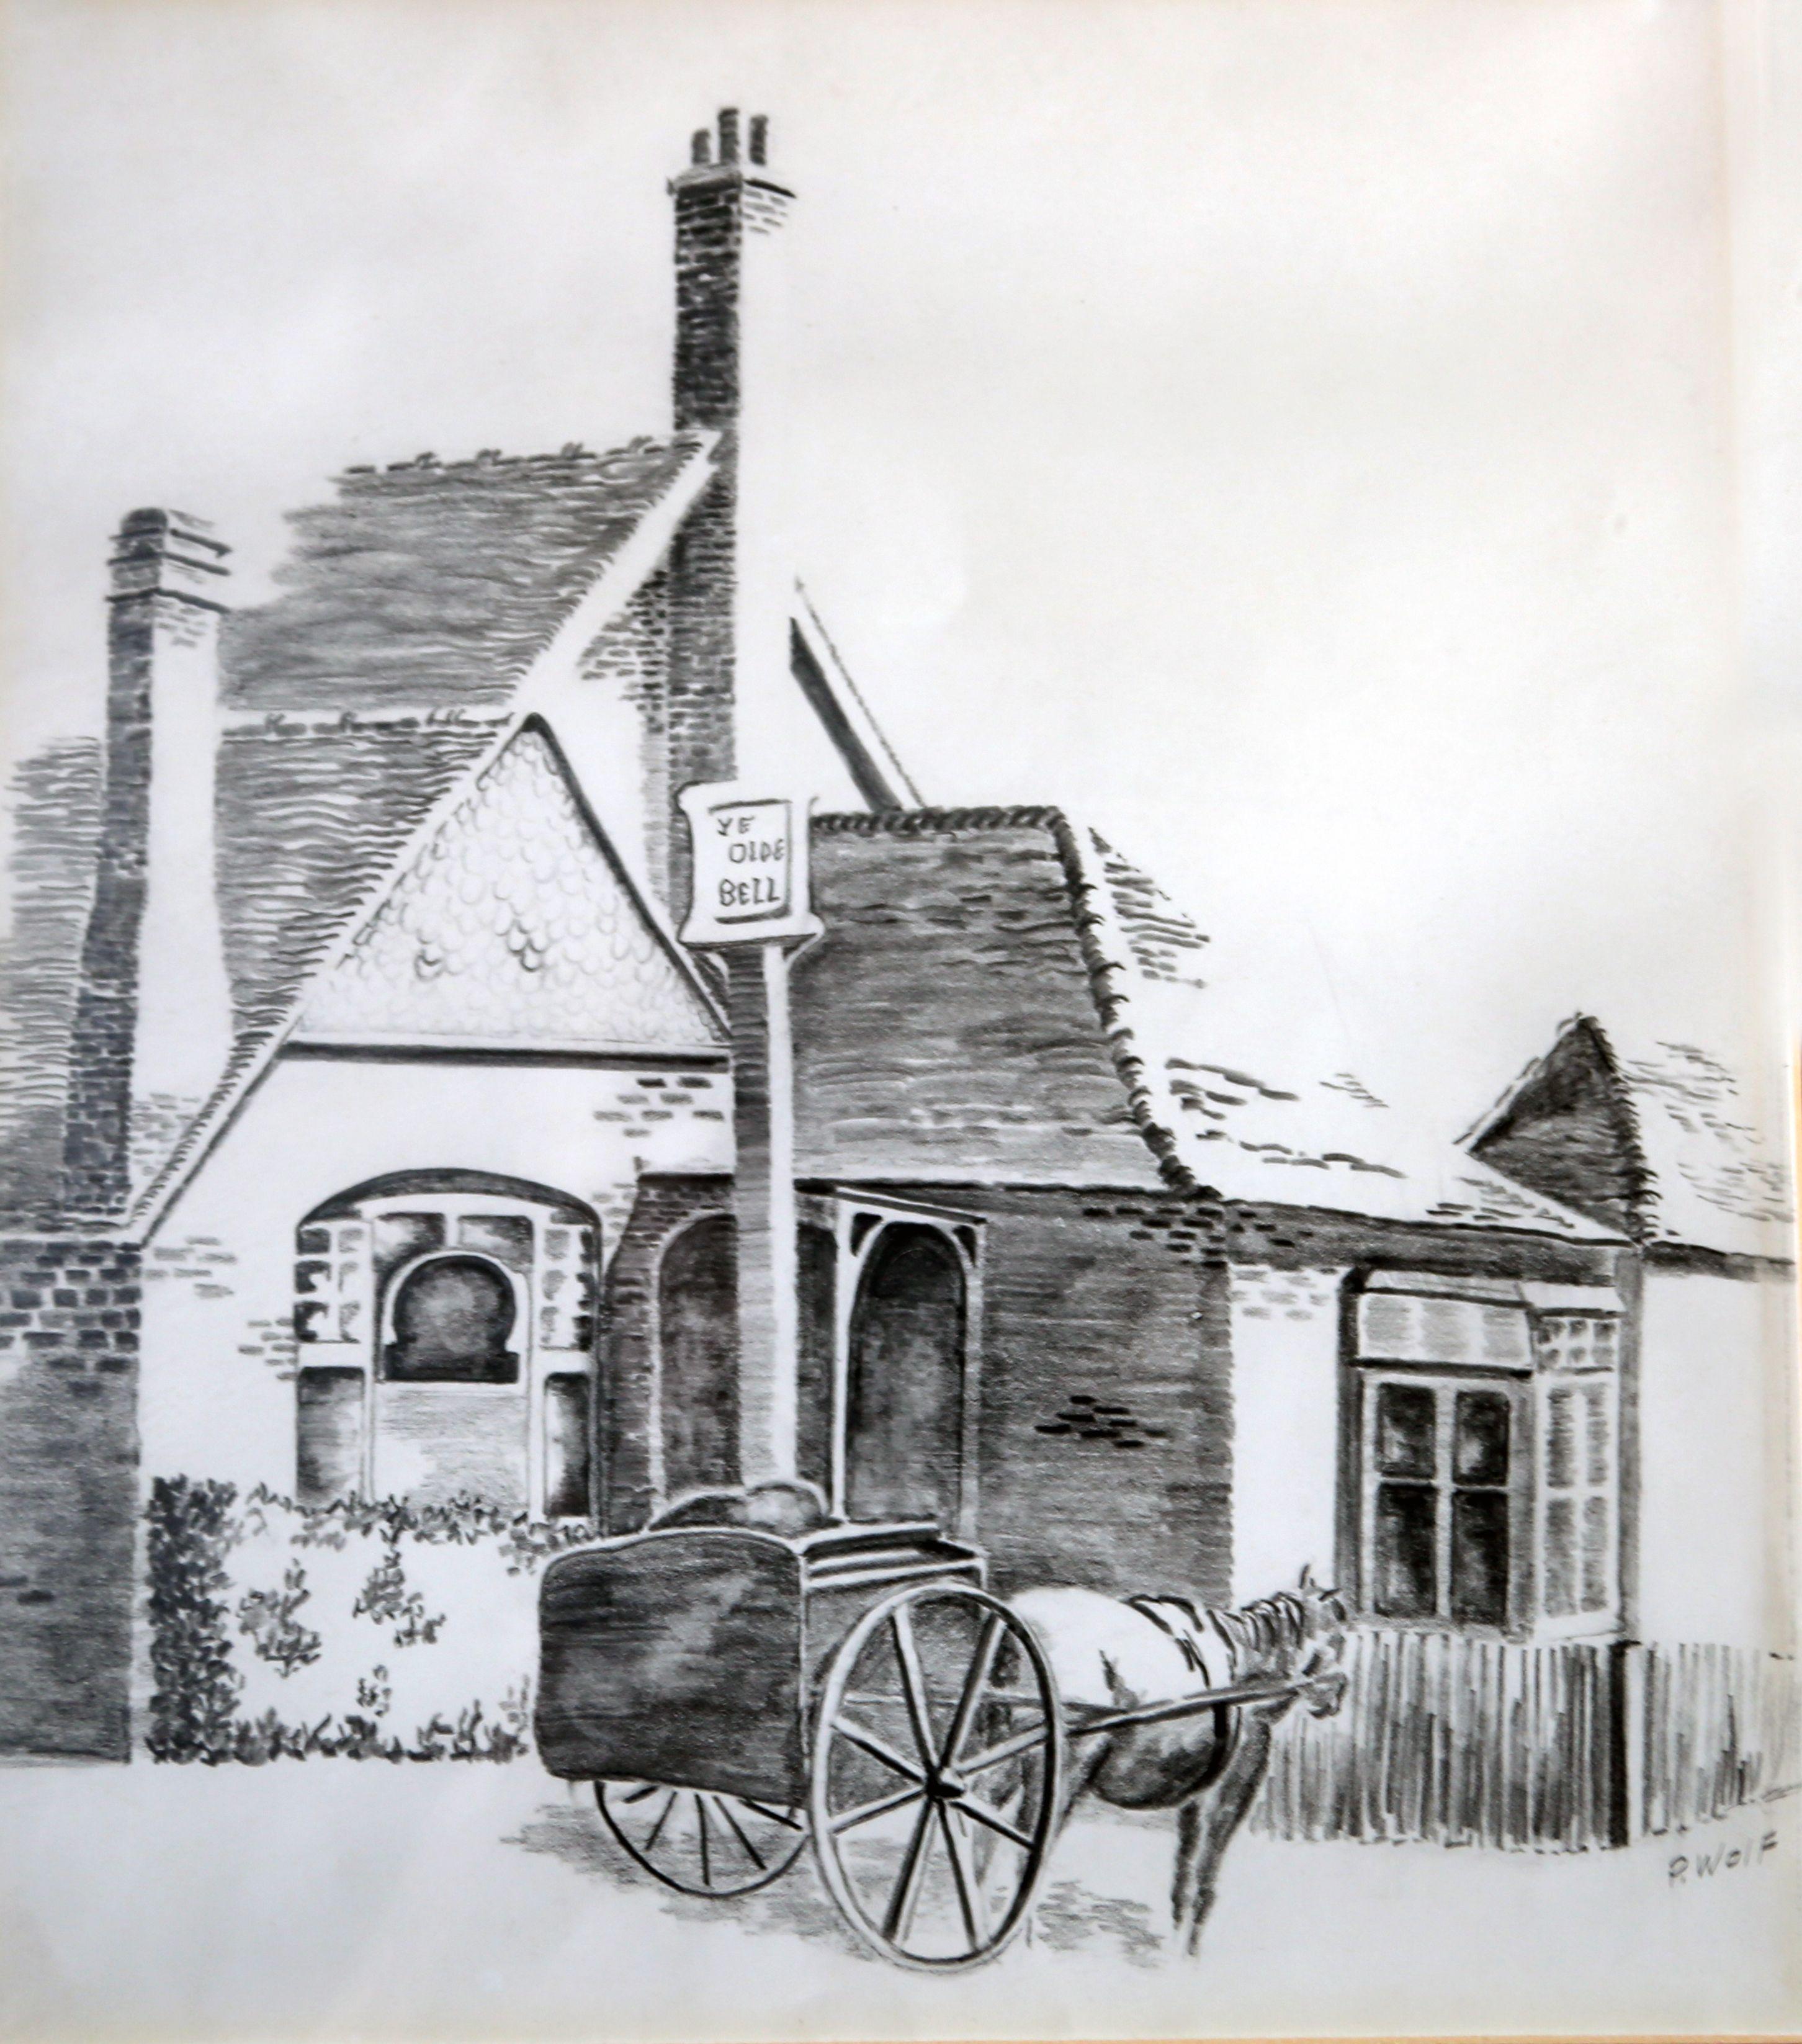 Sketch Of An 1800s English Farmhouse